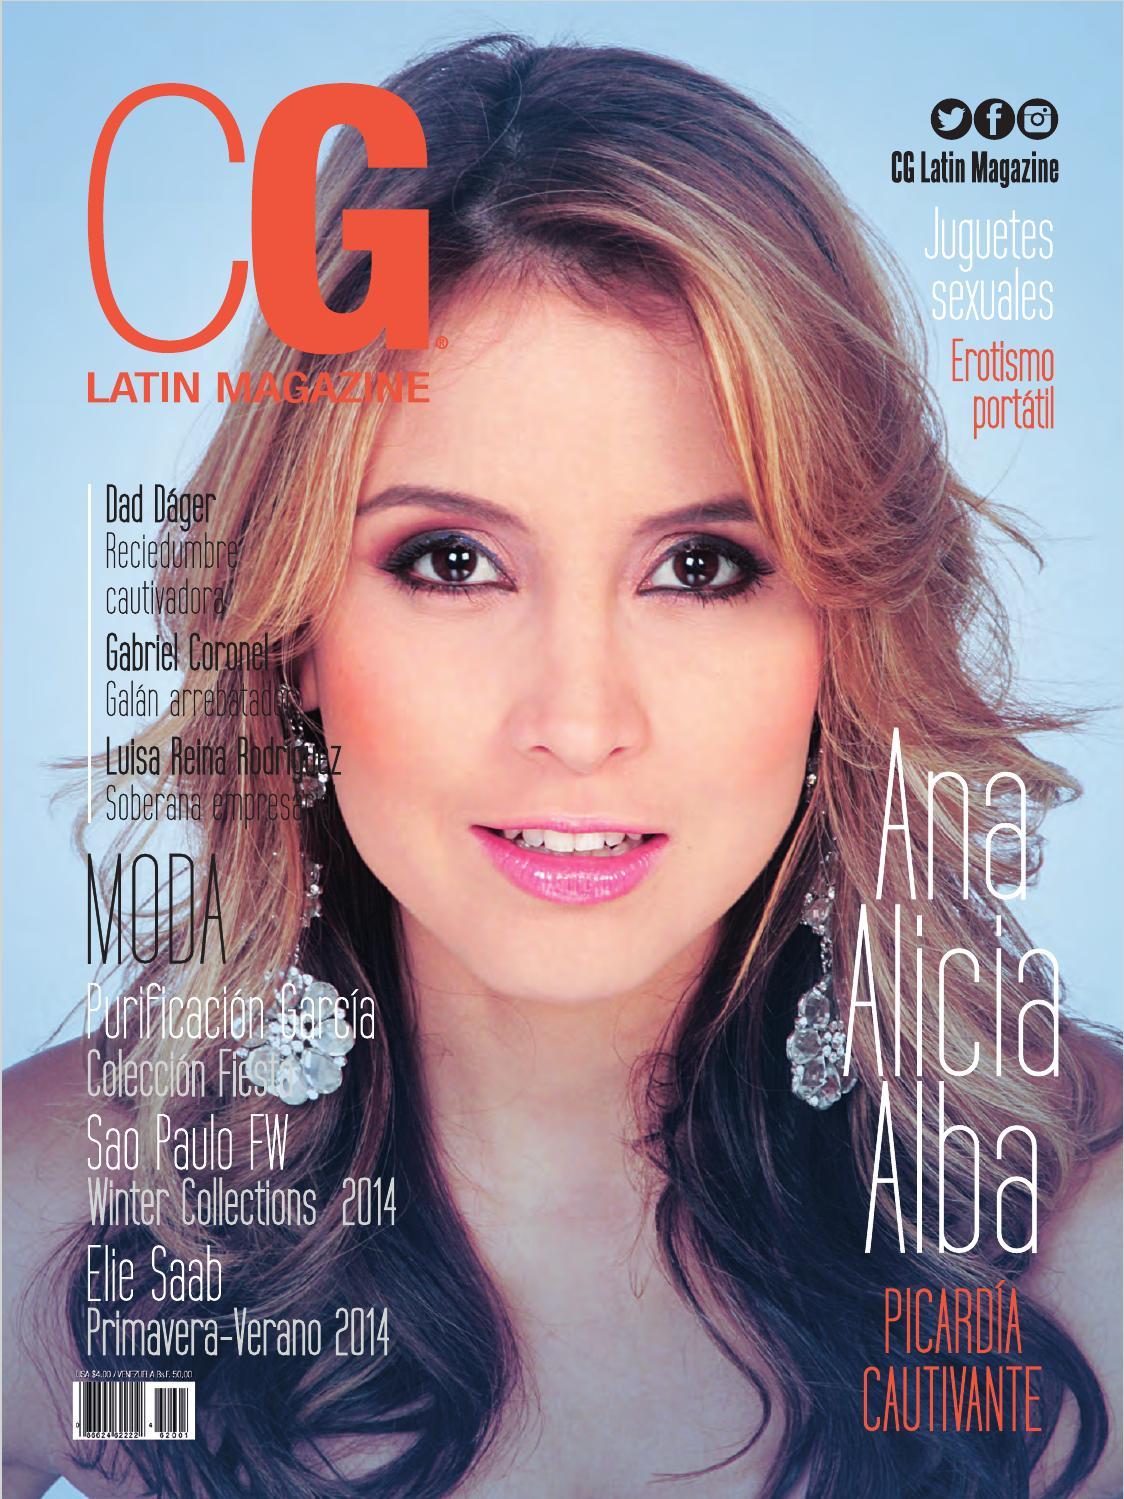 CG Latin Magazine 80 by CG Latin Magazine - issuu